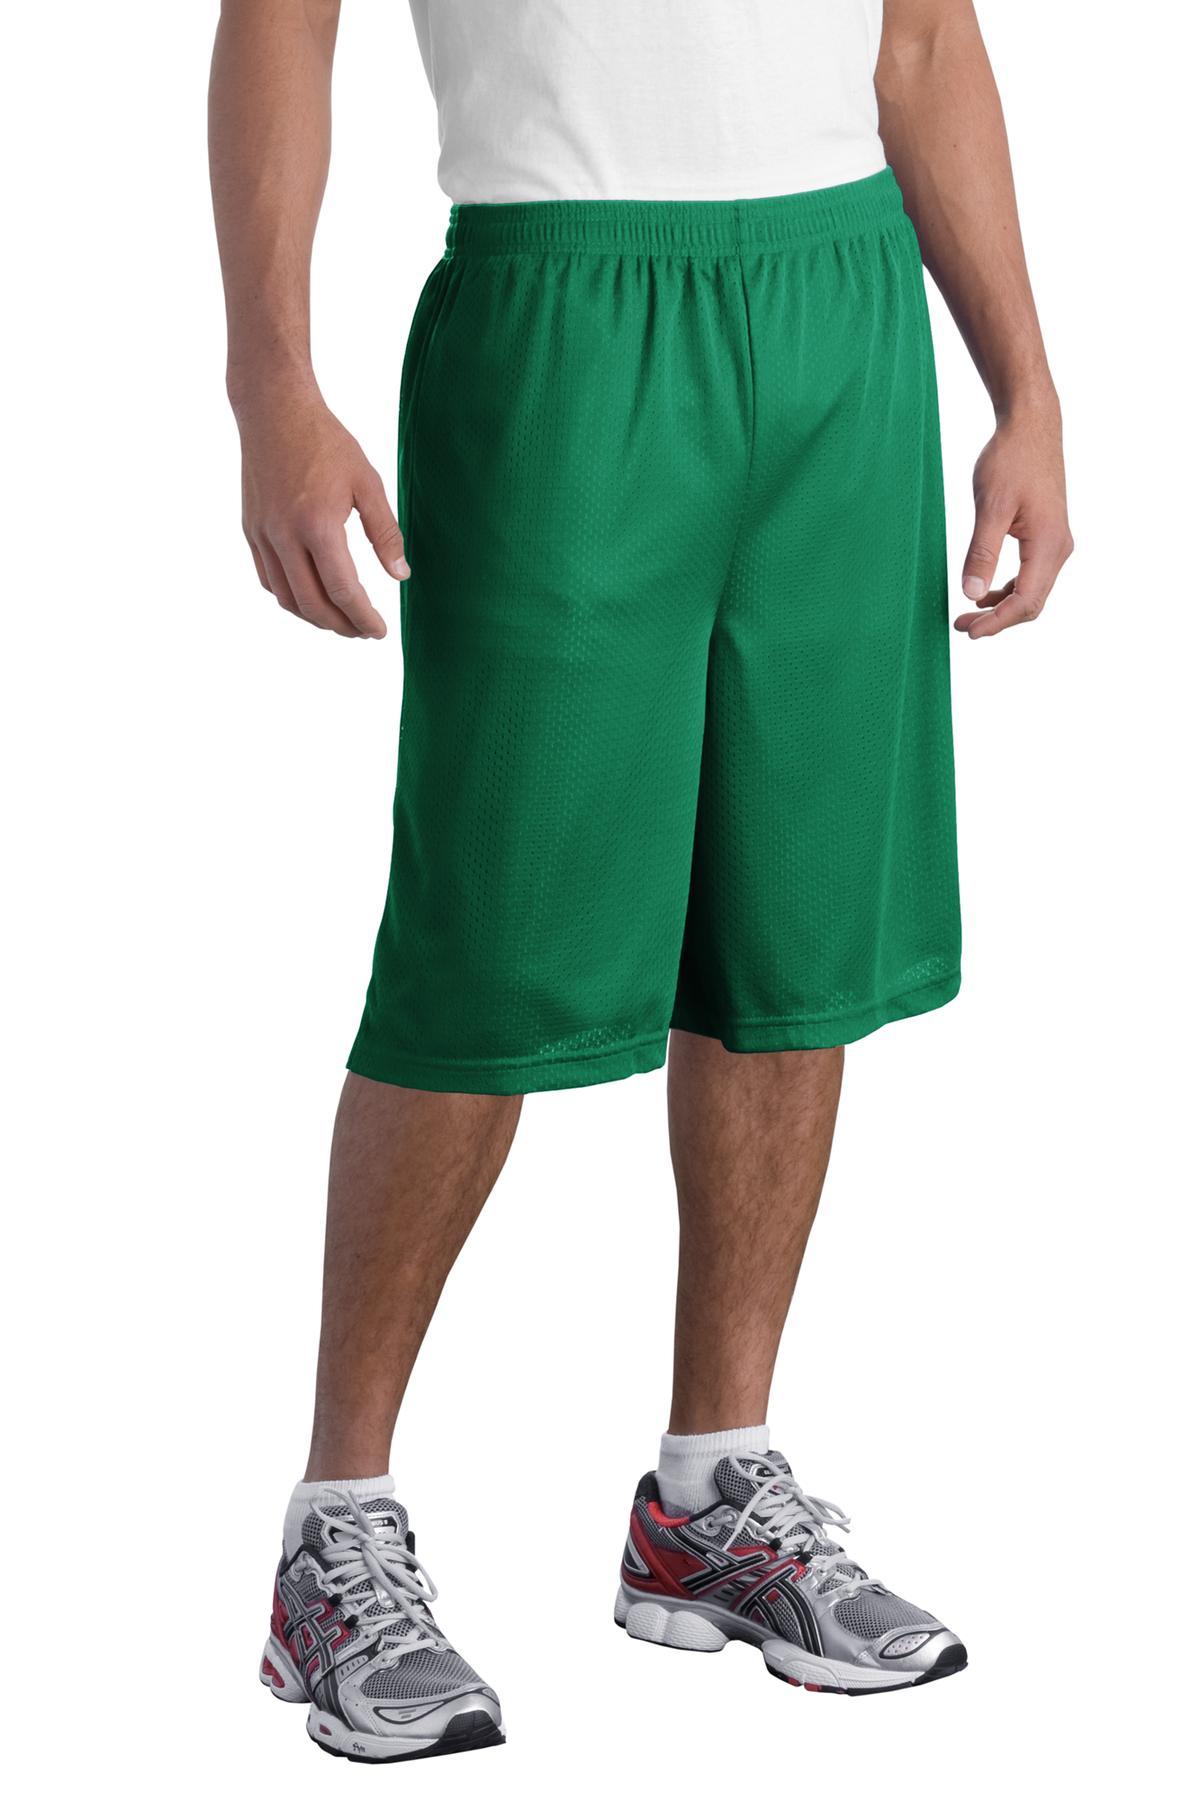 Shorts-13